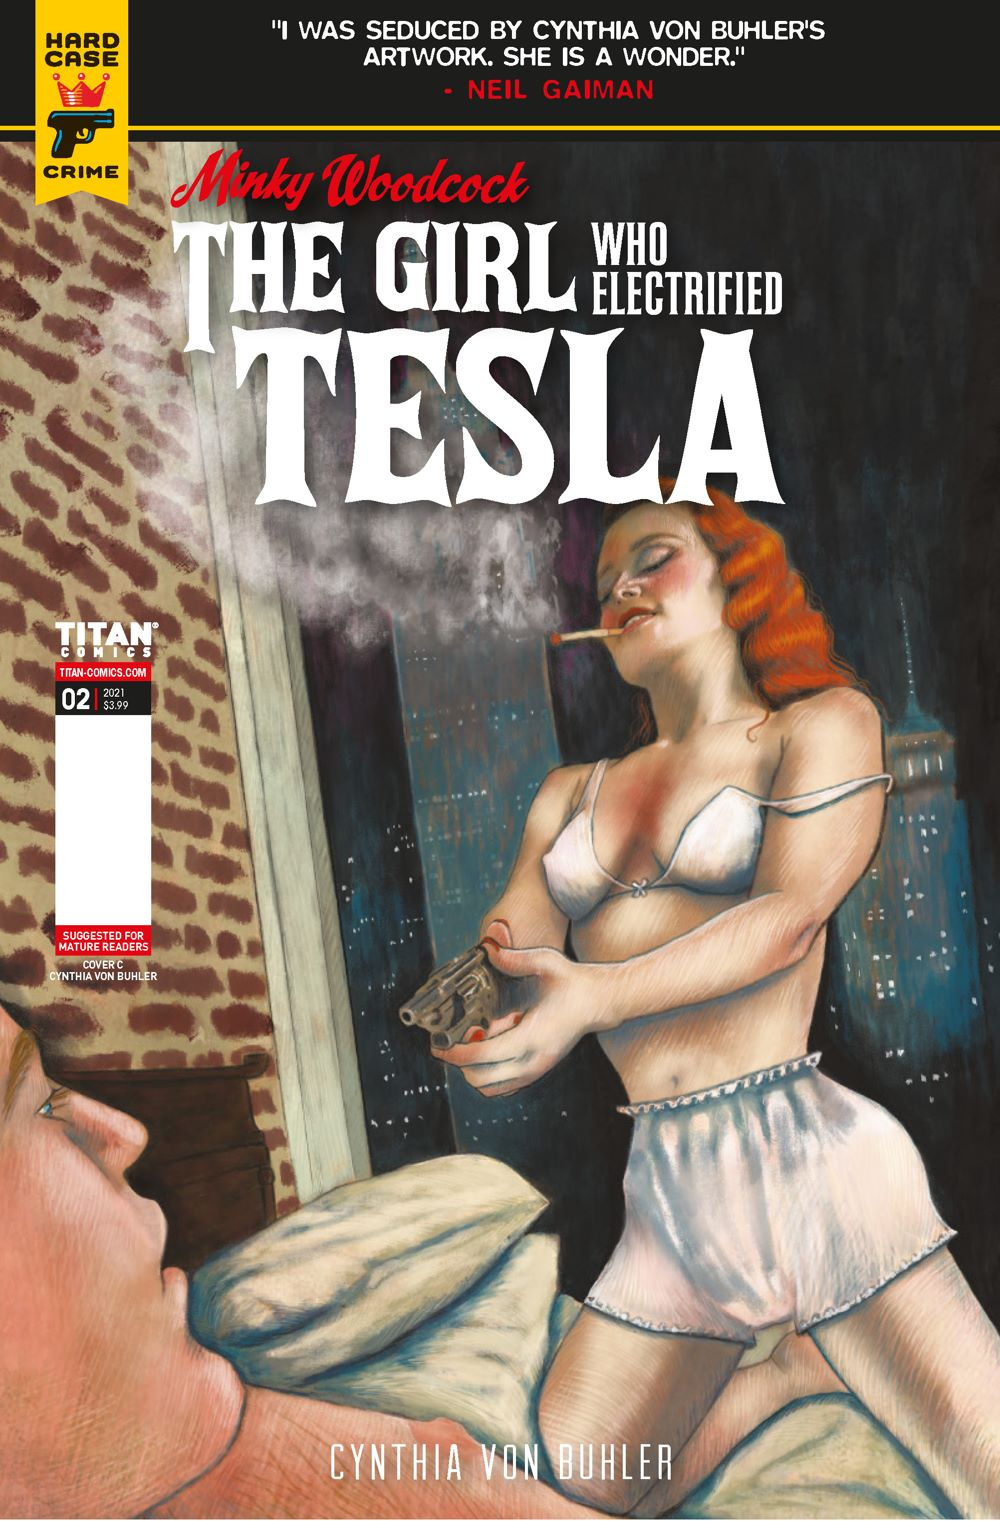 MINKY_WOODCOCK_ARC2_2_BUHLER ComicList Previews: MINKY WOODCOCK THE GIRL WHO ELECTRIFIED TESLA #2